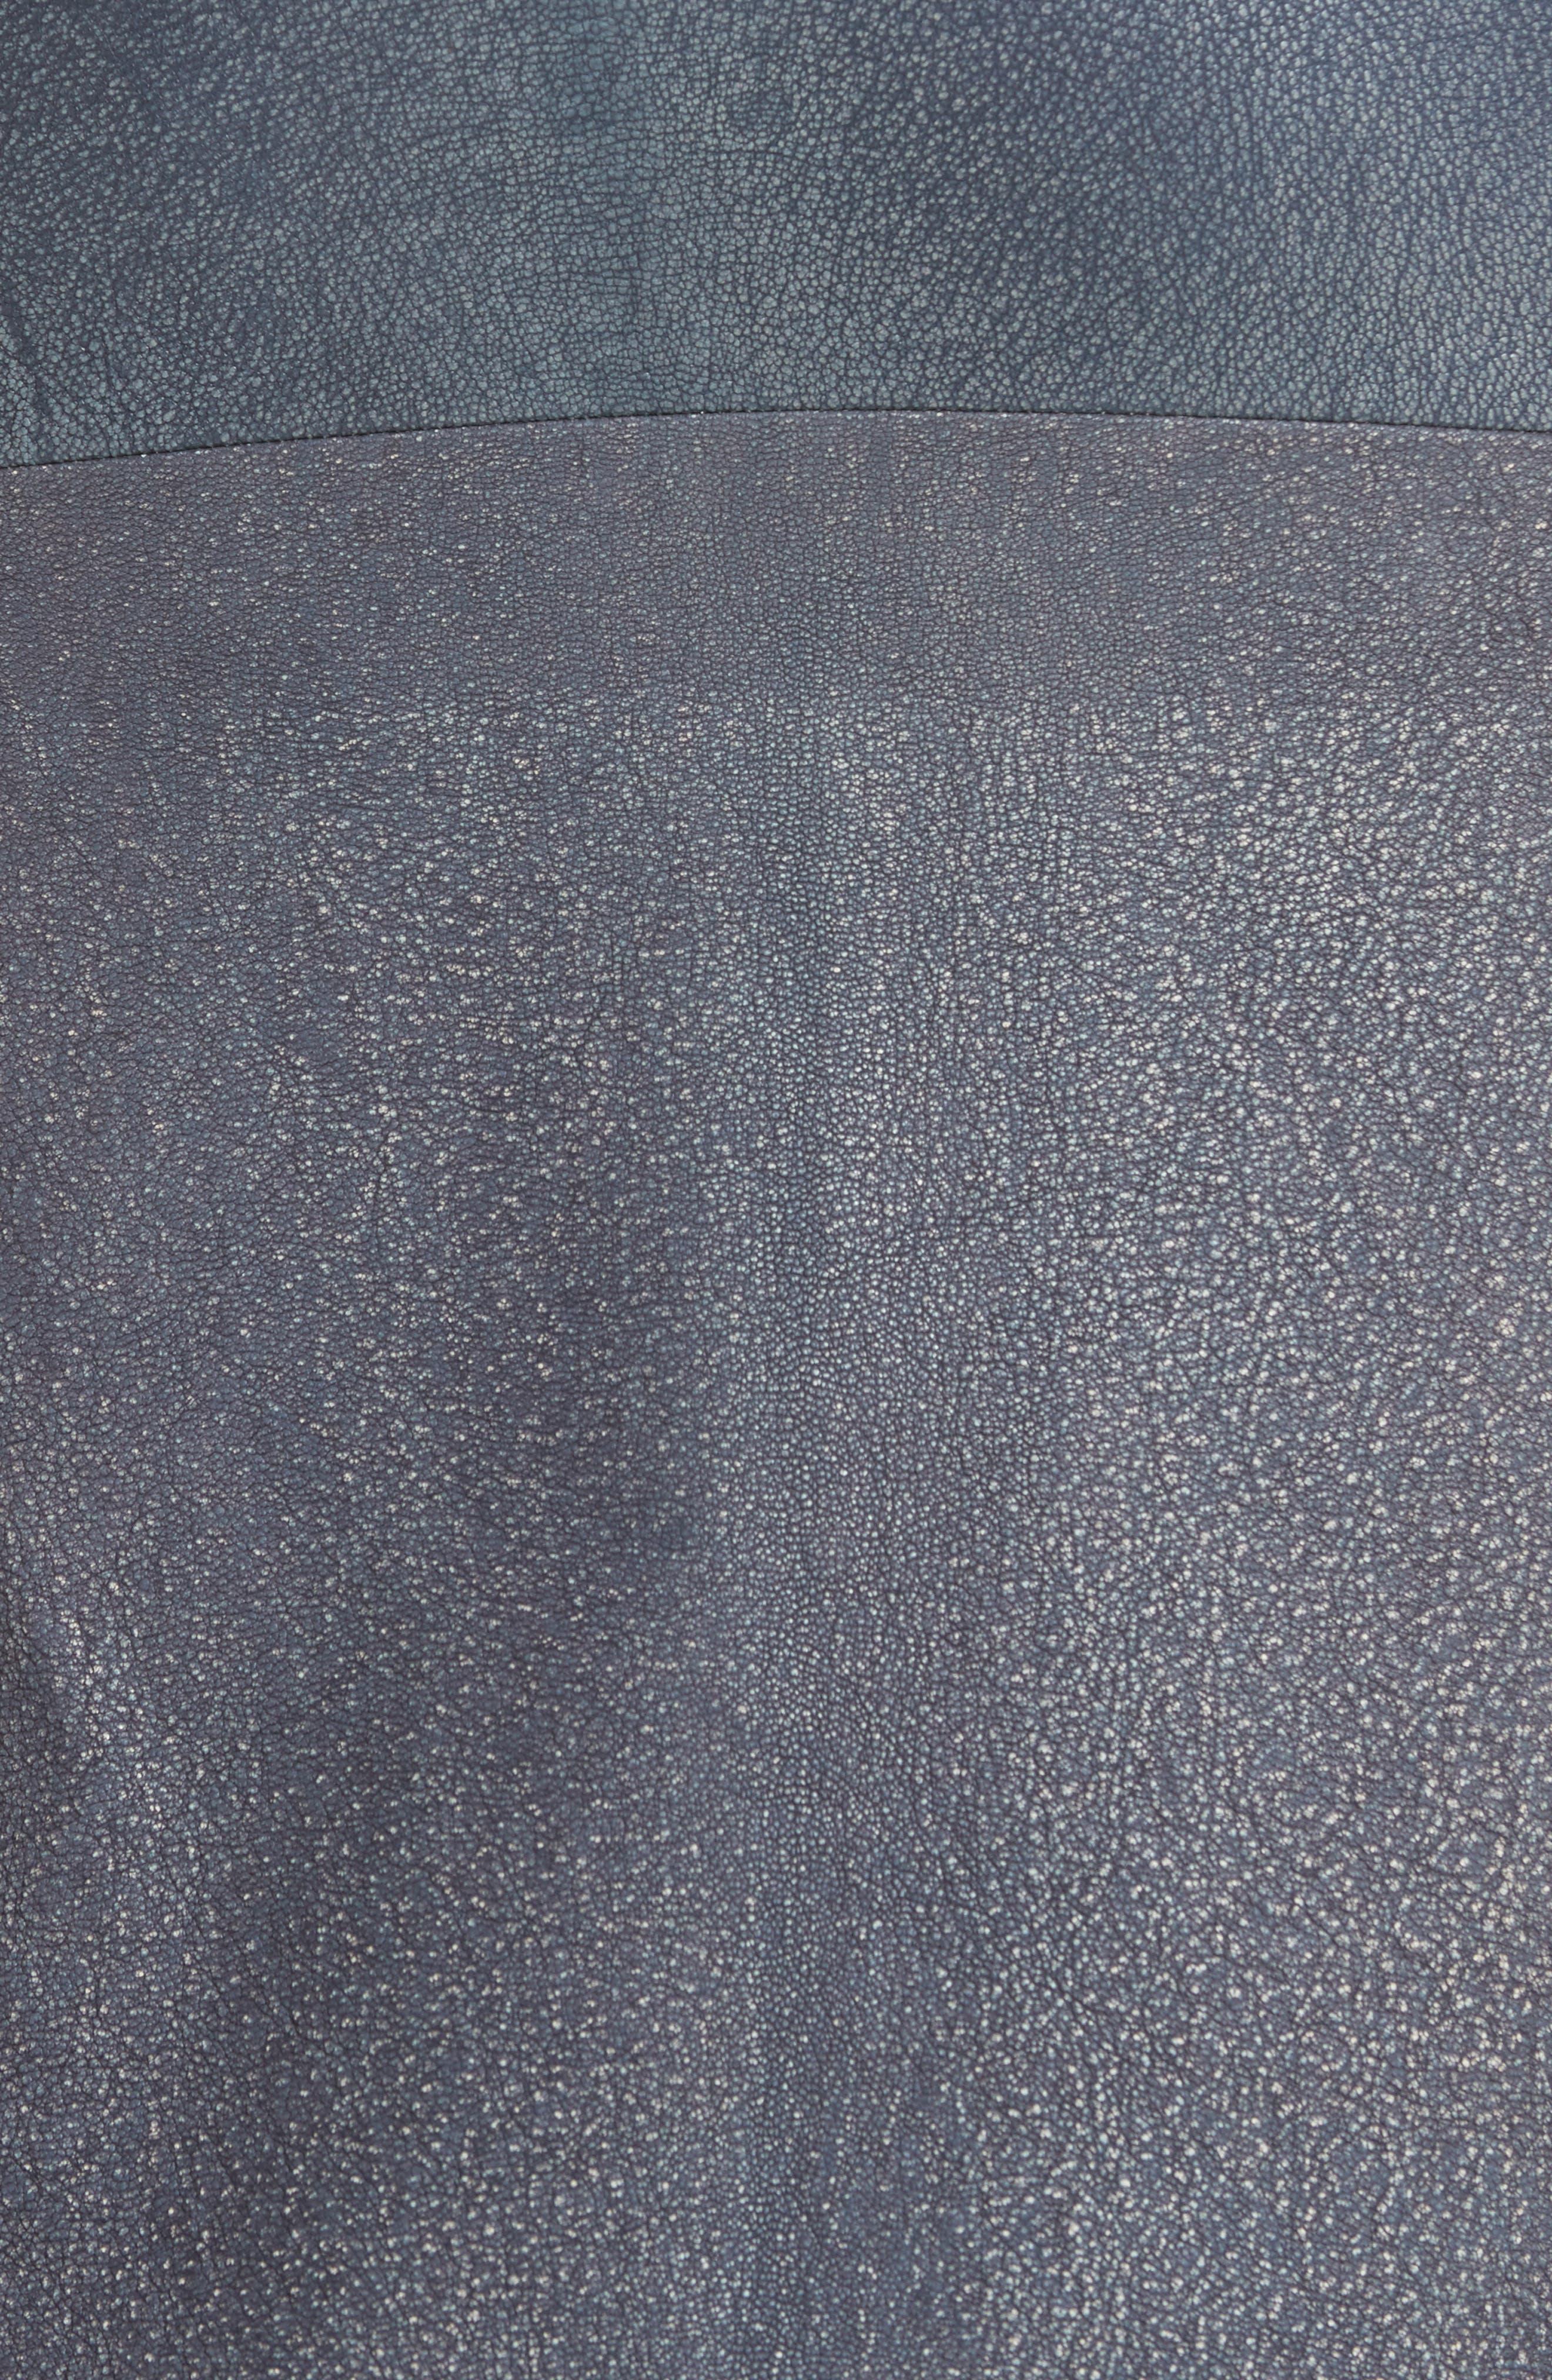 Rai Leather Curved Skirt,                             Alternate thumbnail 5, color,                             400